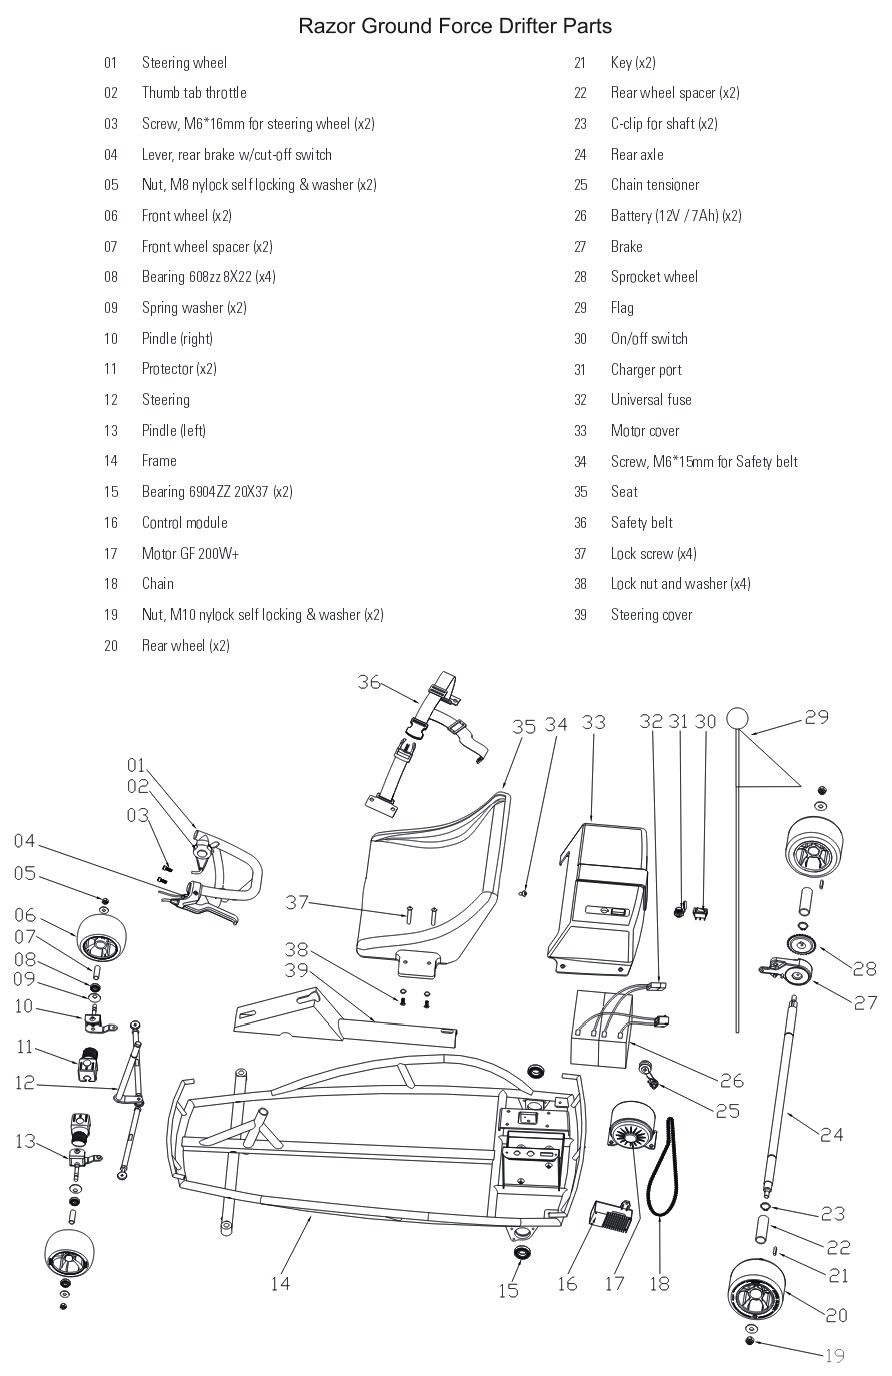 [BE_0933] Ground Force Drifter Wiring Diagram Schematic Wiring